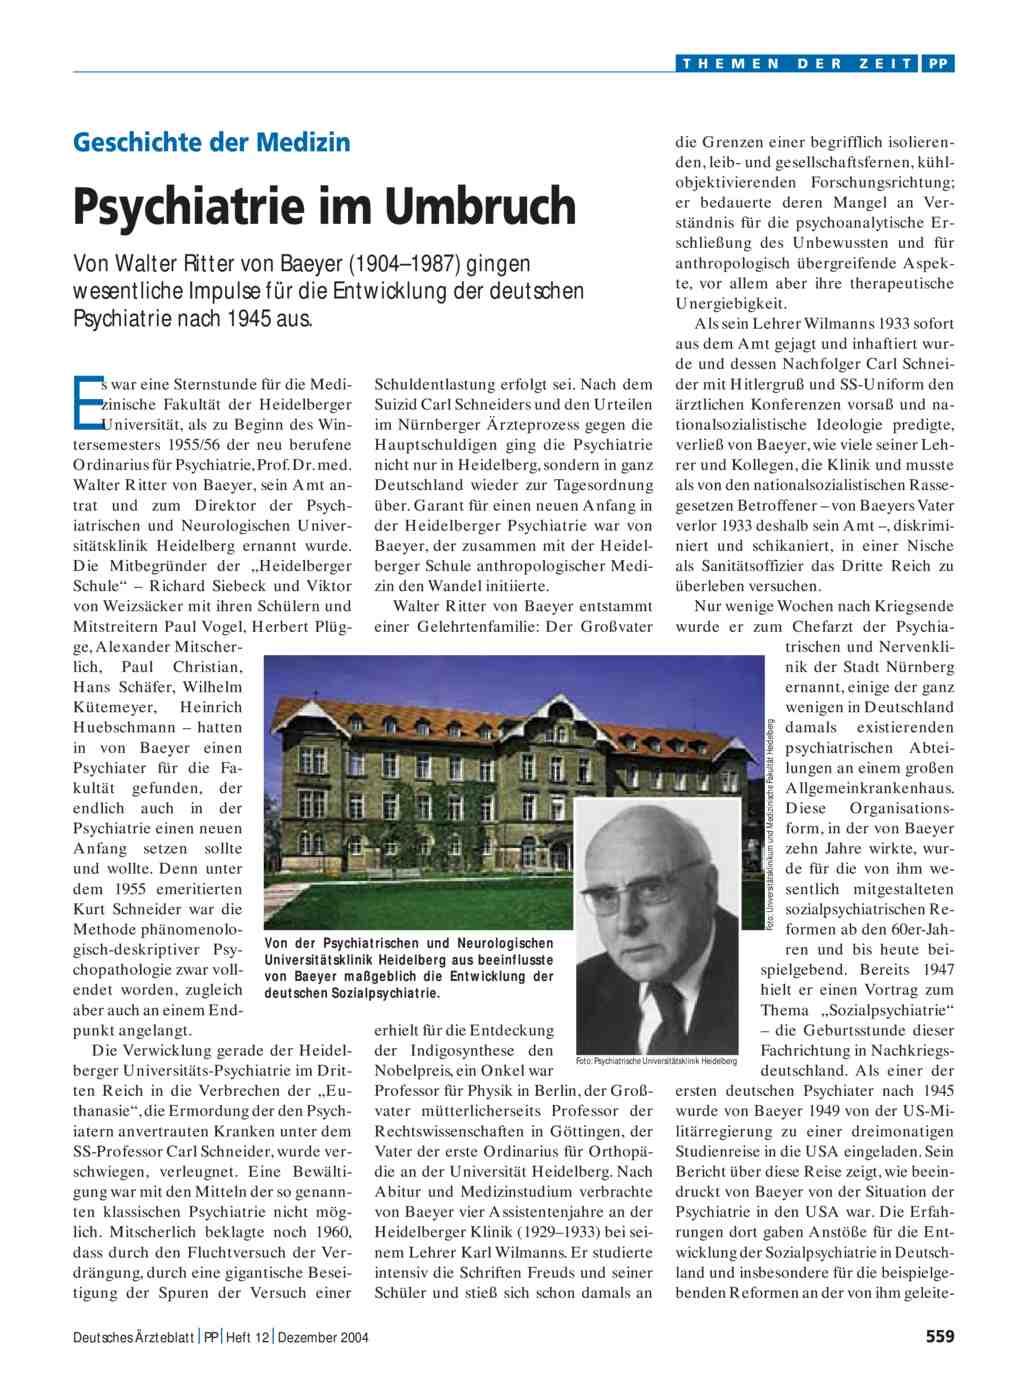 psychiater heidelberg